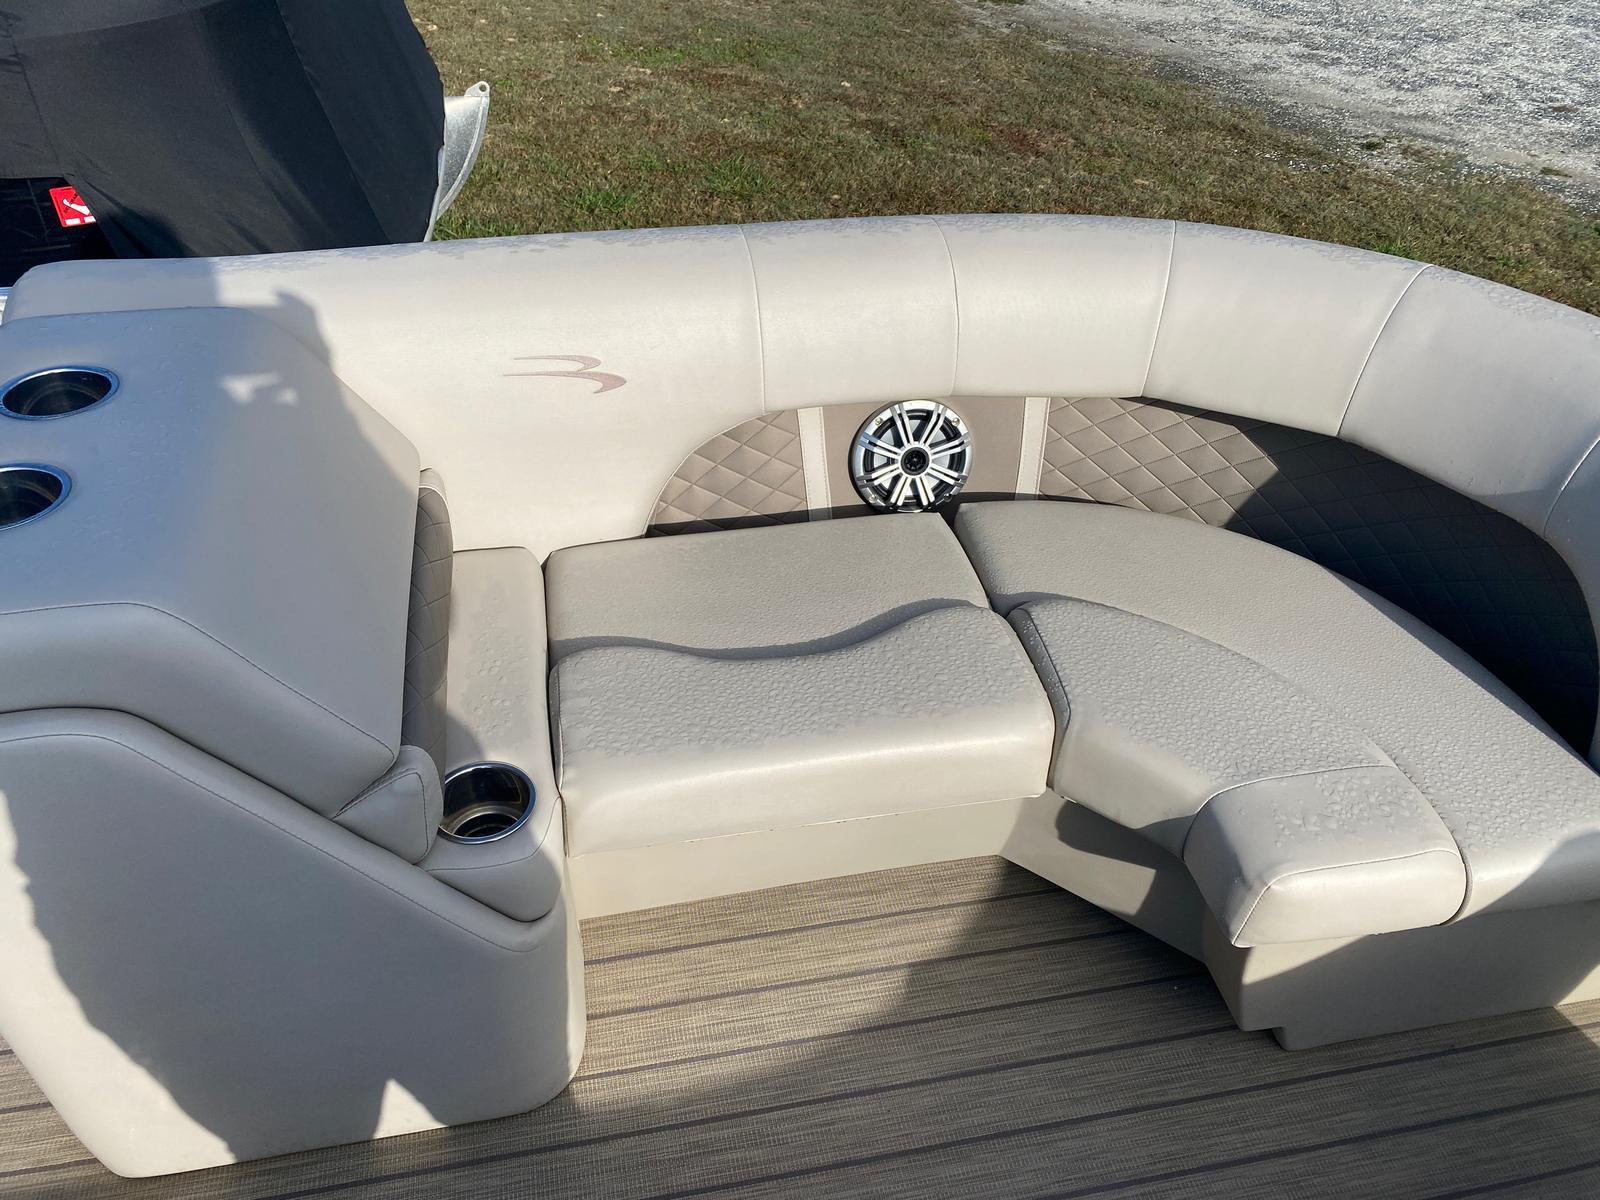 2018 Bennington boat for sale, model of the boat is 22 SSX Pontoon & Image # 3 of 13